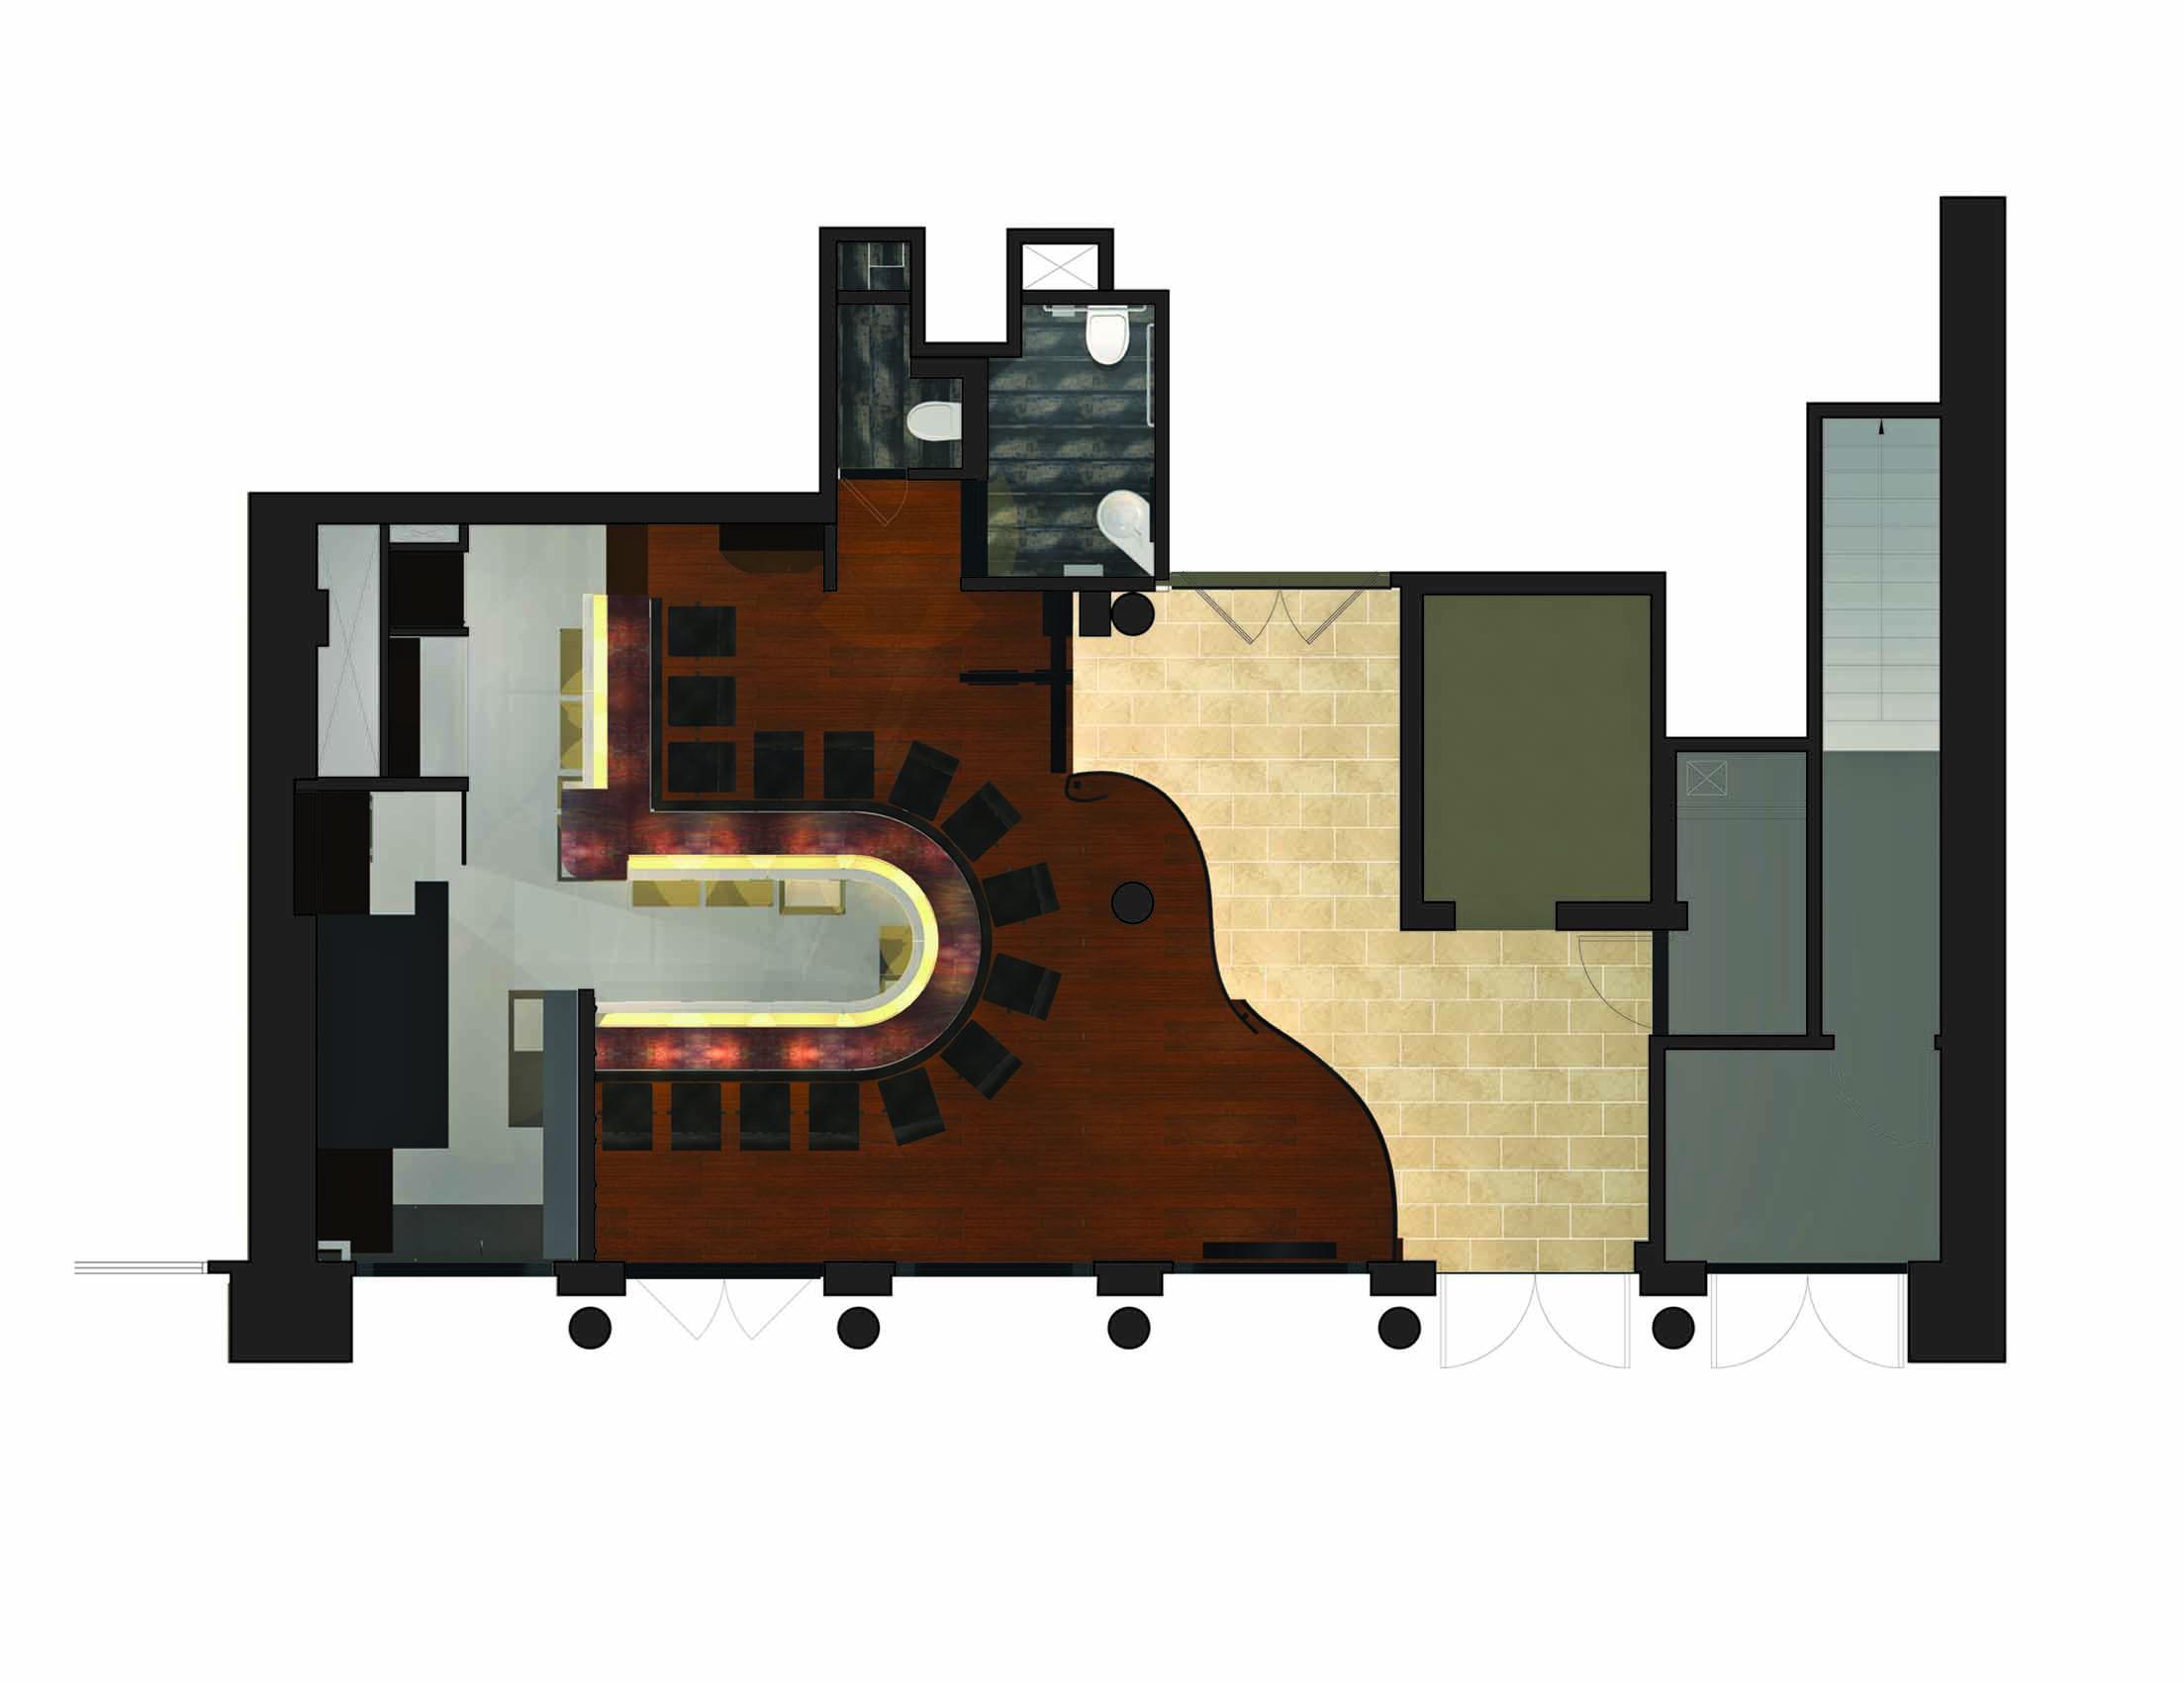 Compose Floor Plan - Rendered